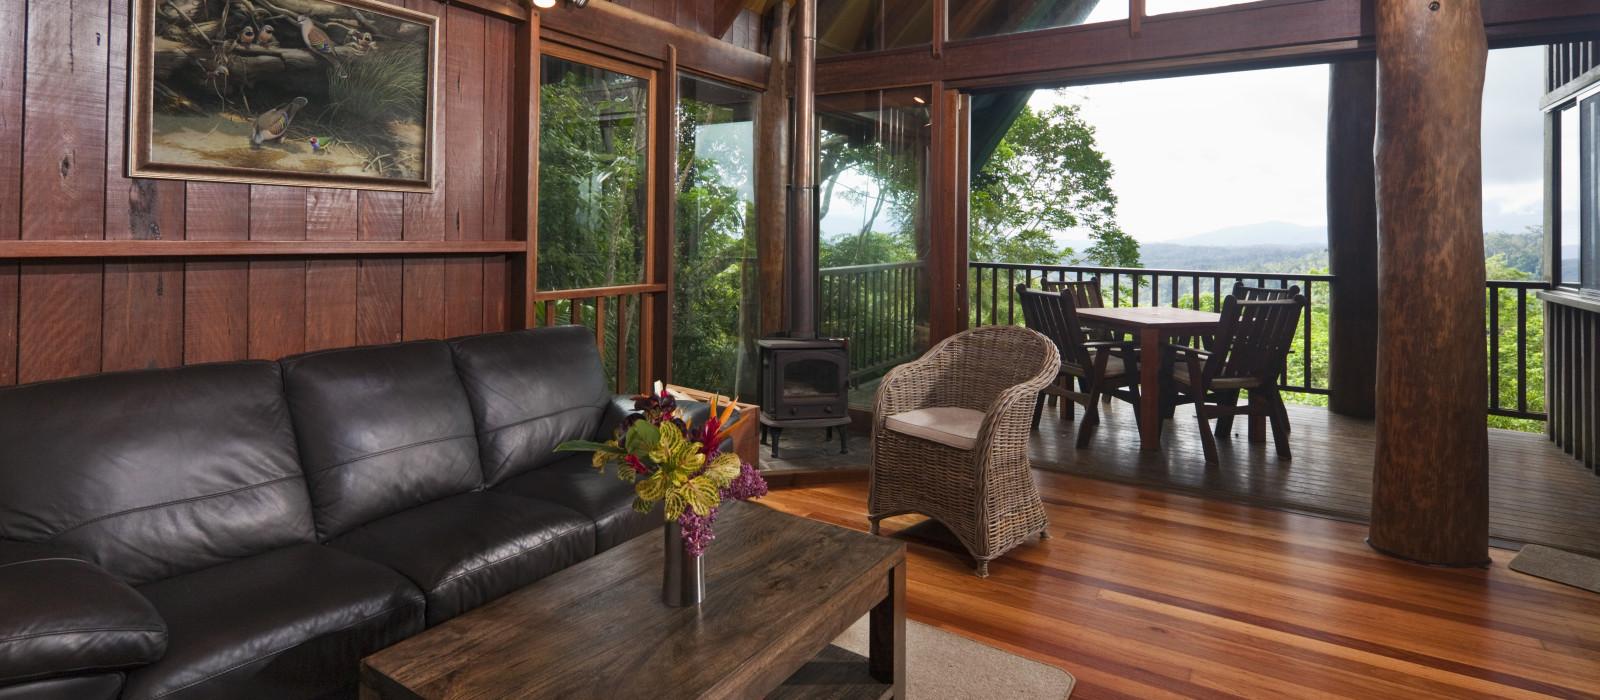 Hotel Rose Gums Wilderness Retreat Australia